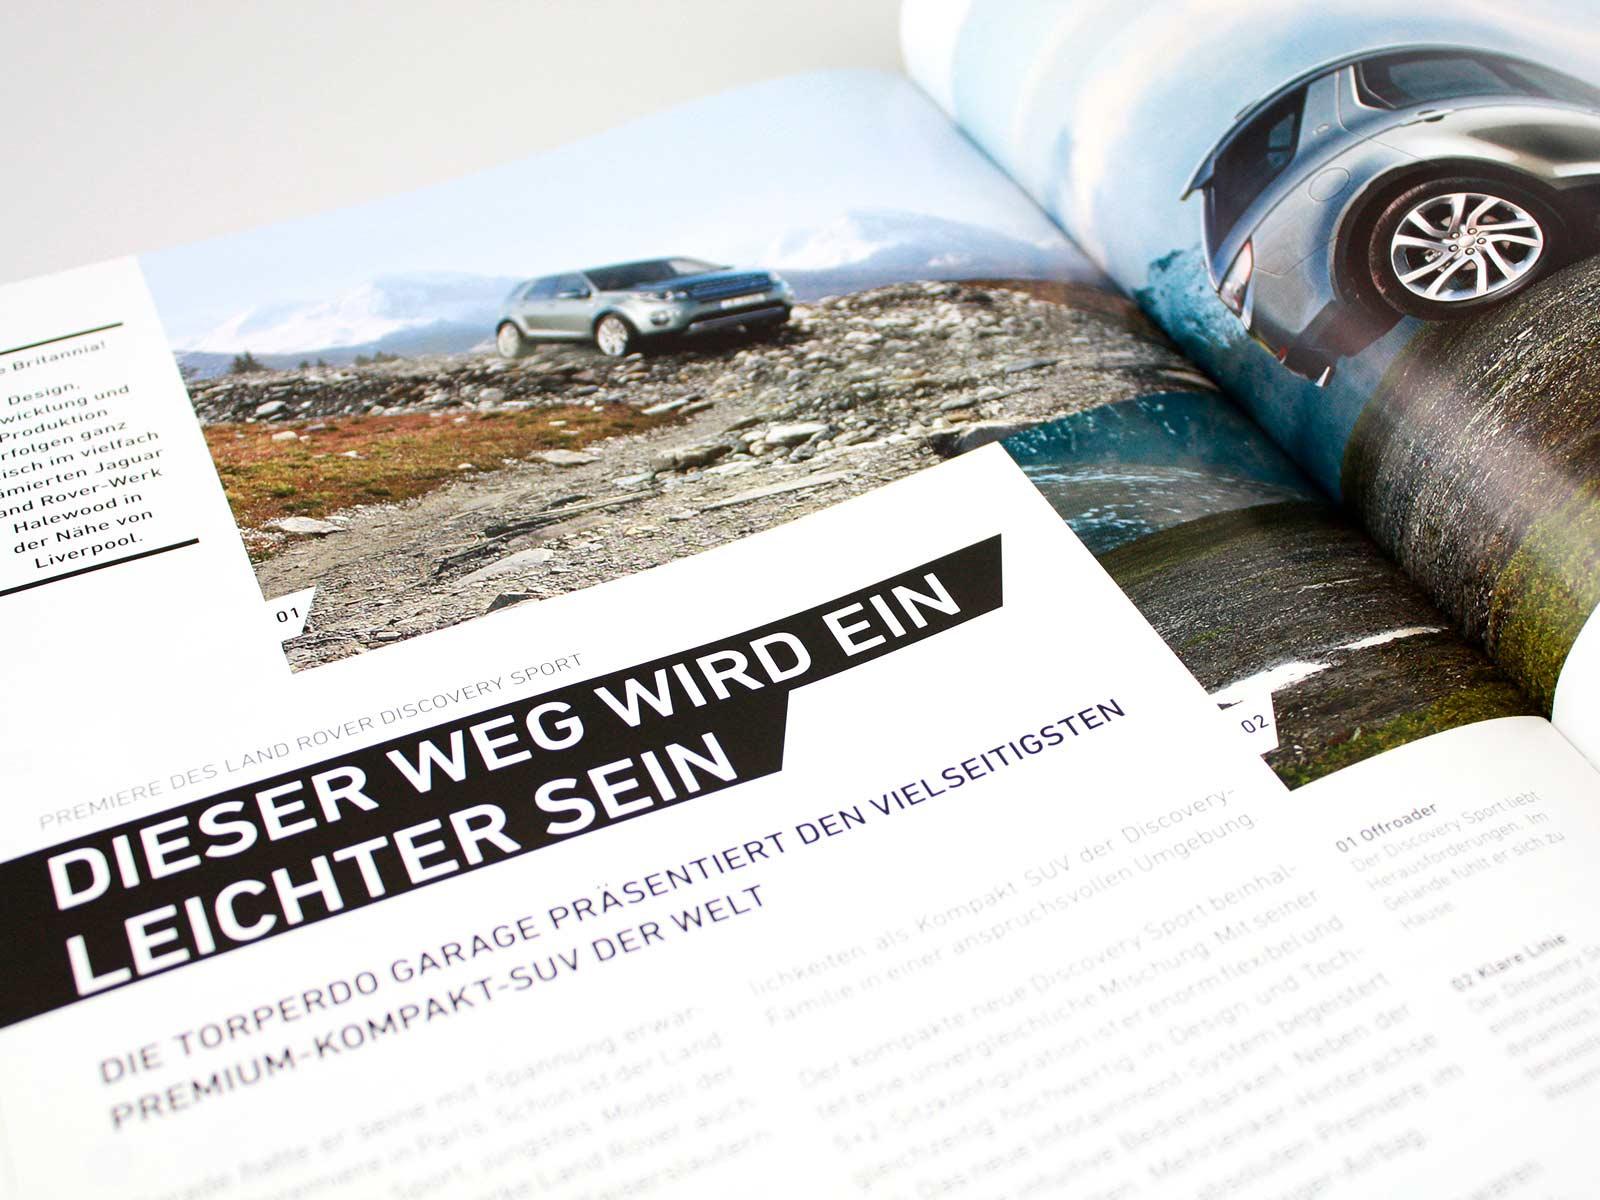 tg magazin 2 matricks marketing werbeagentur frankfurt kaiserslautern. Black Bedroom Furniture Sets. Home Design Ideas